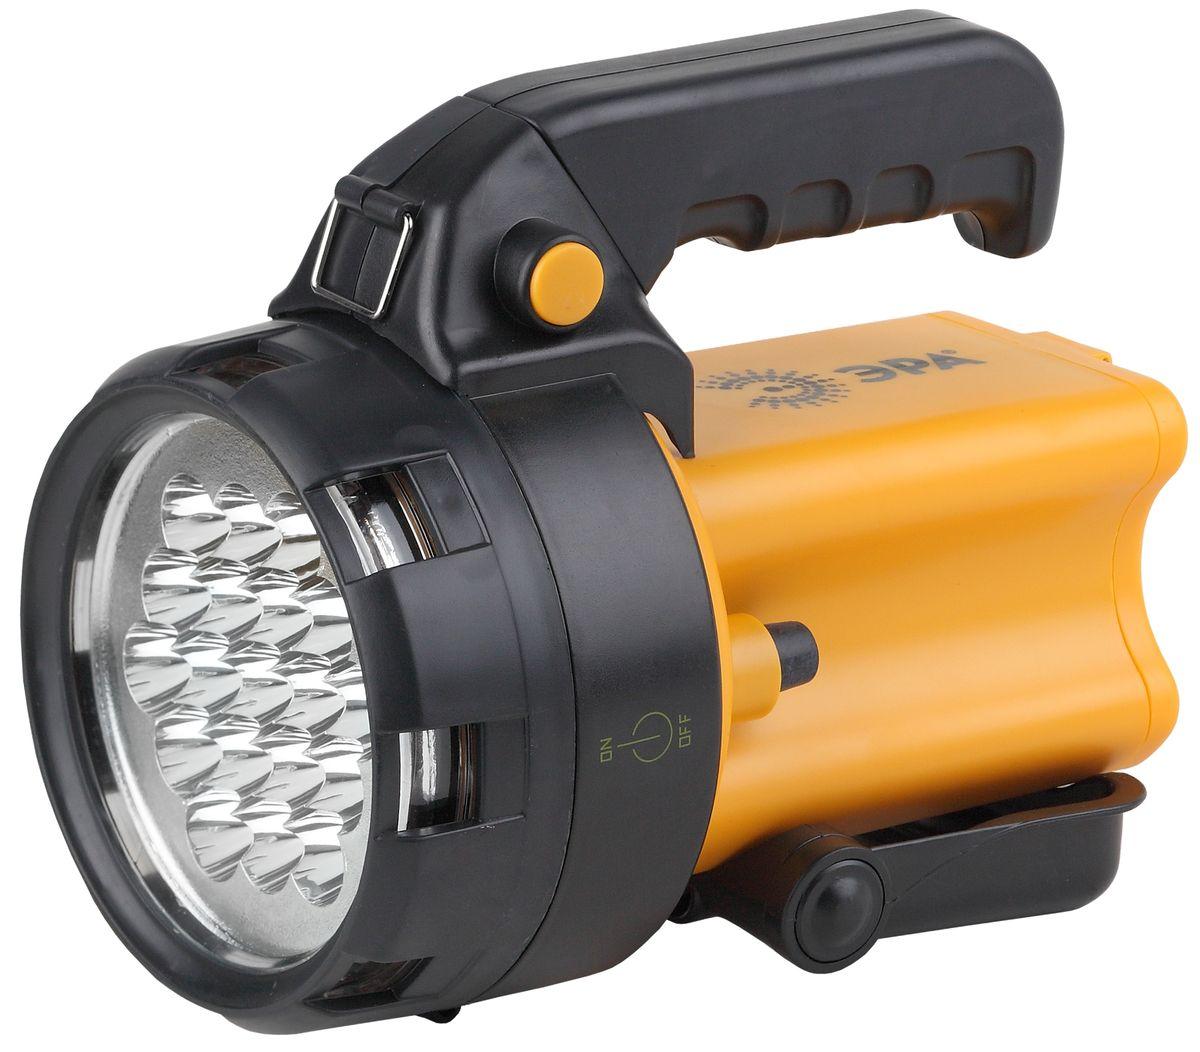 Фонарь ручной Эра, 19 x LED, аккумулятор 4,5Ah, ЗУ 220V+12V фонарь ручной эра 3 w led